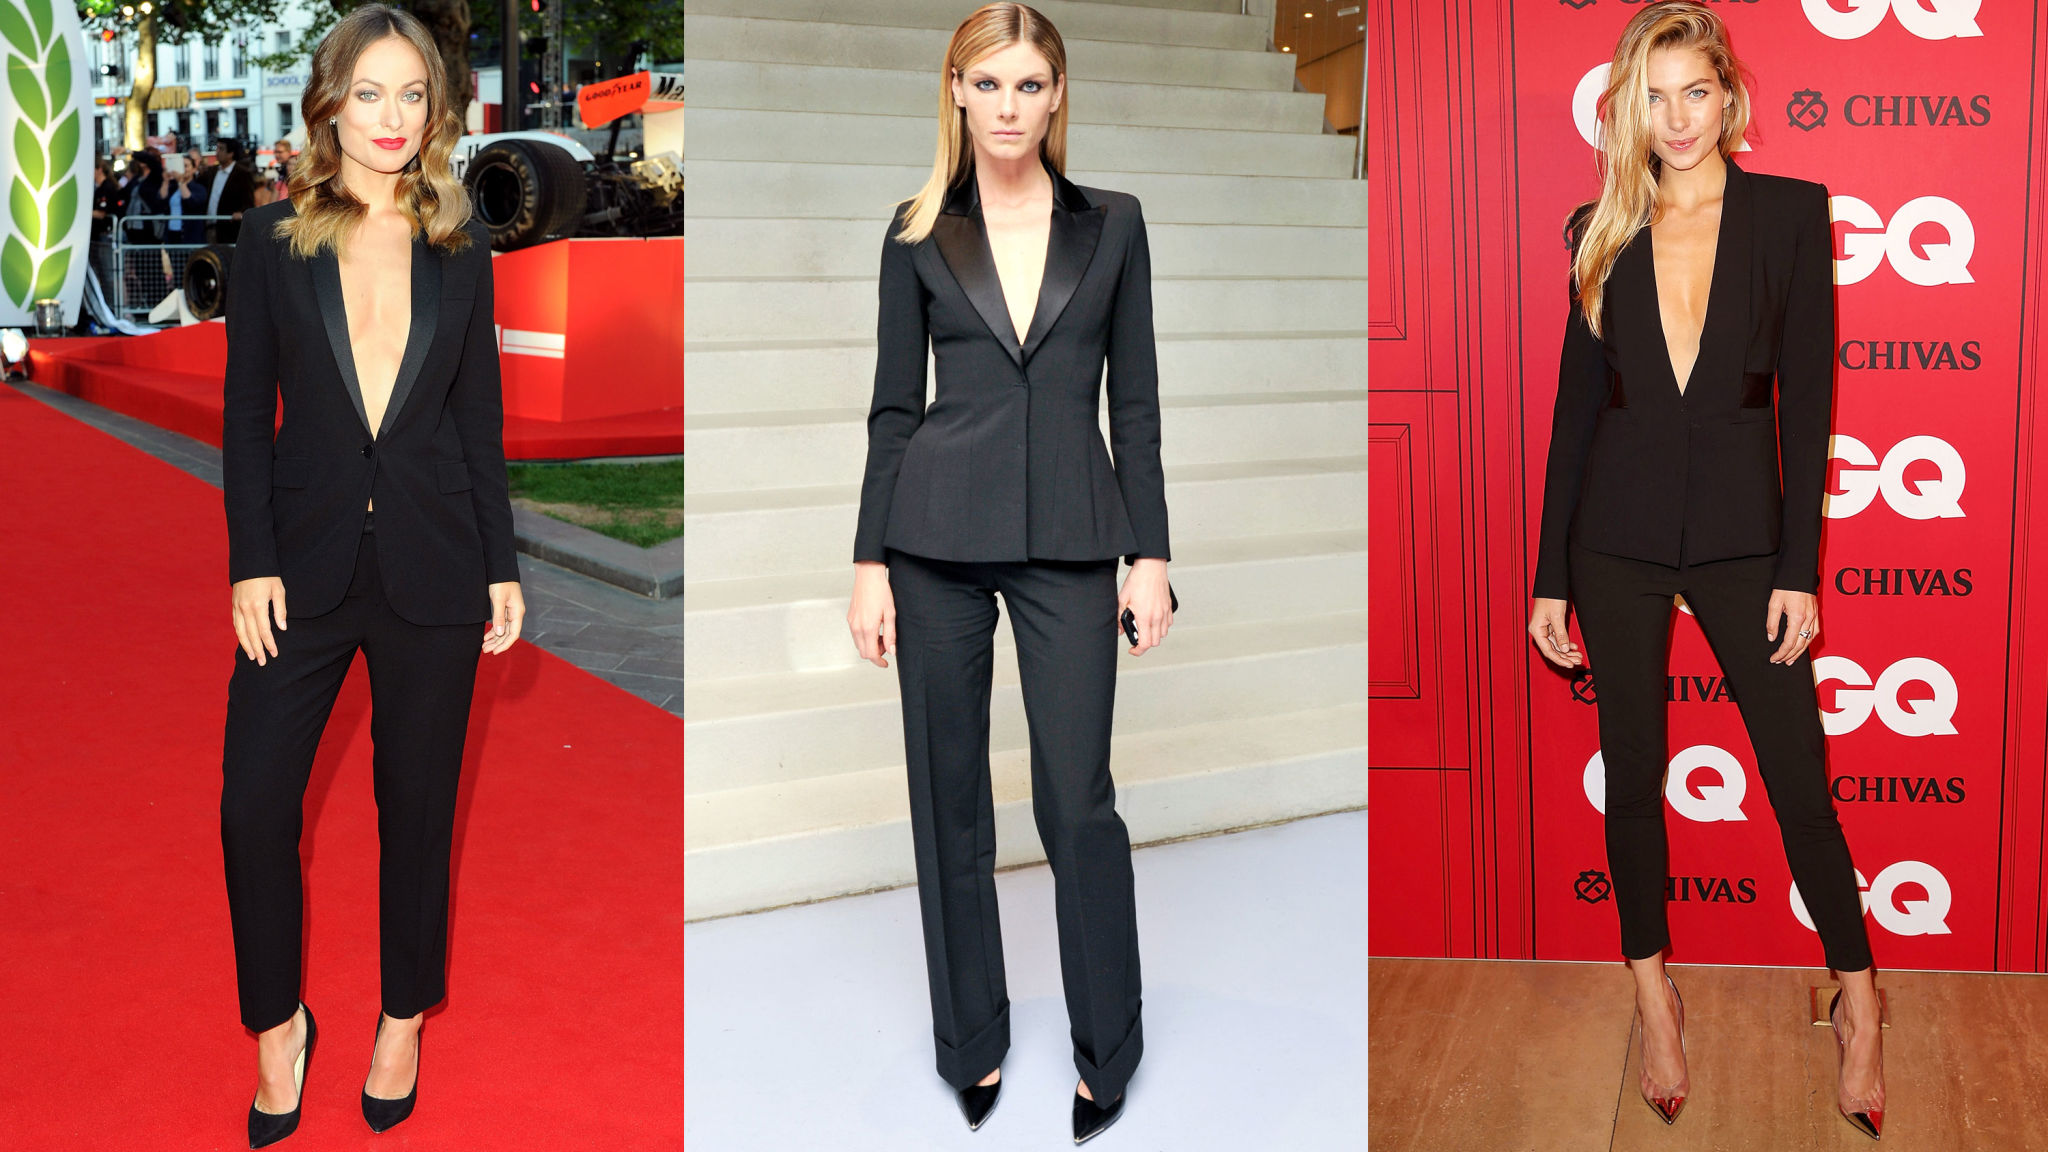 #theLIST: Le Smoking Tuxedo Shopping Guide - Best Designer ...